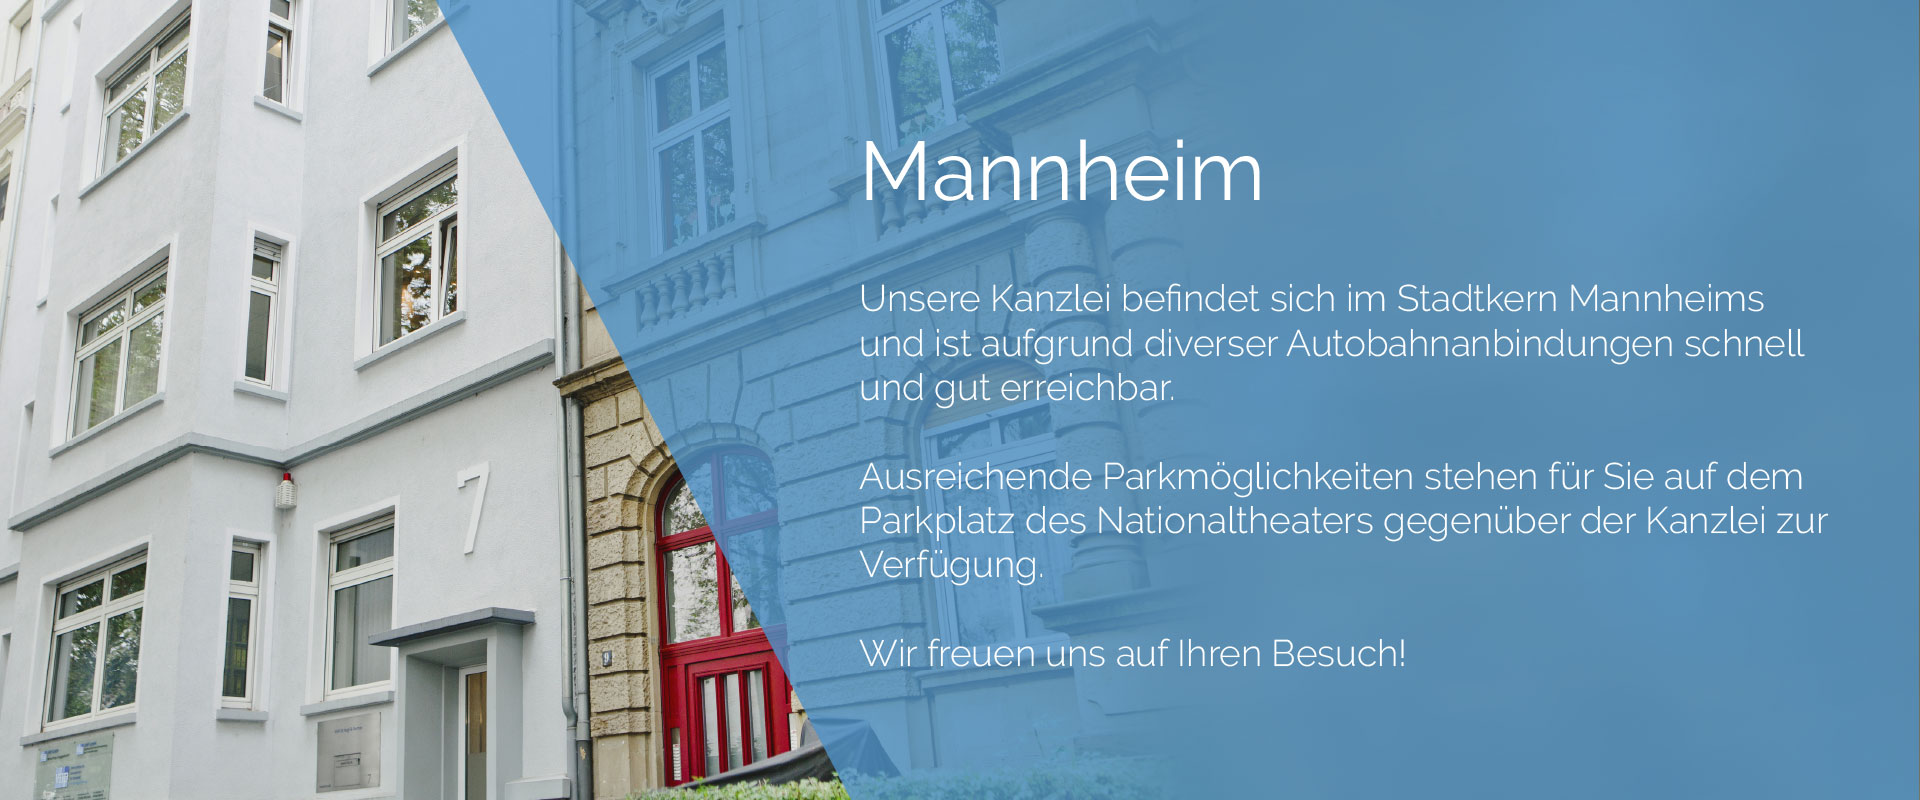 VHP-Mannheim